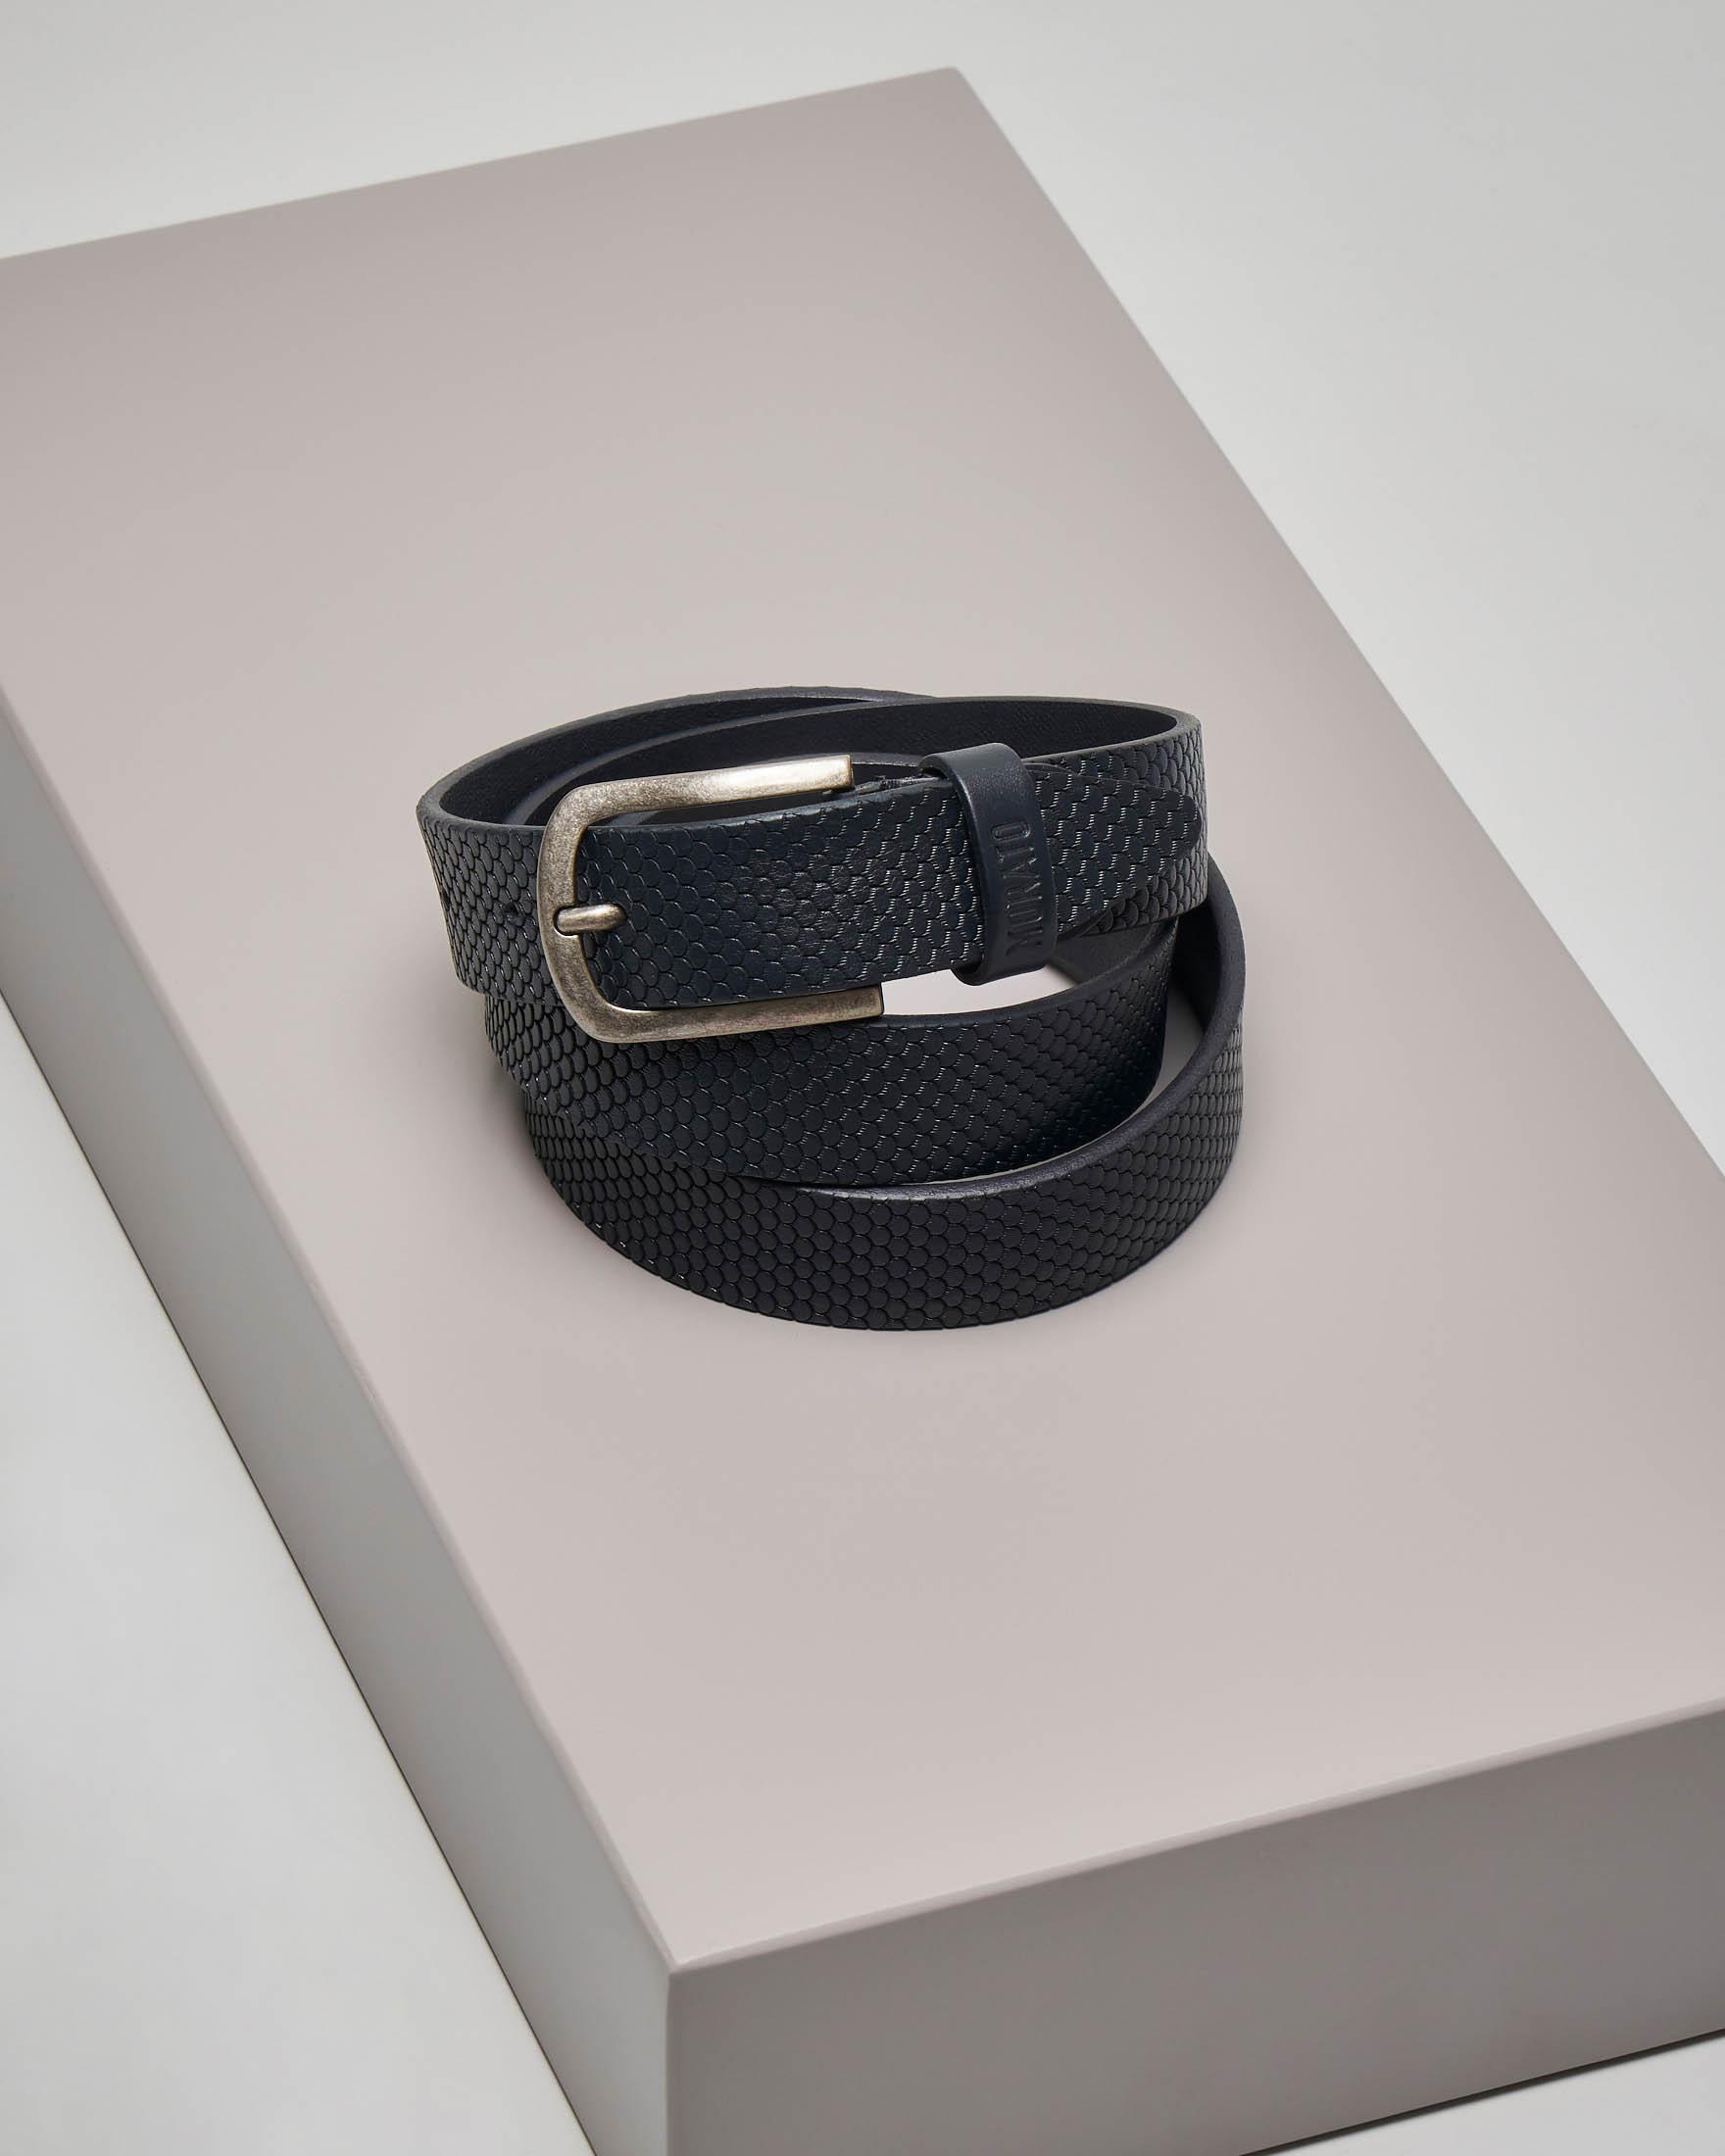 Cintura blu in pelle lavorata